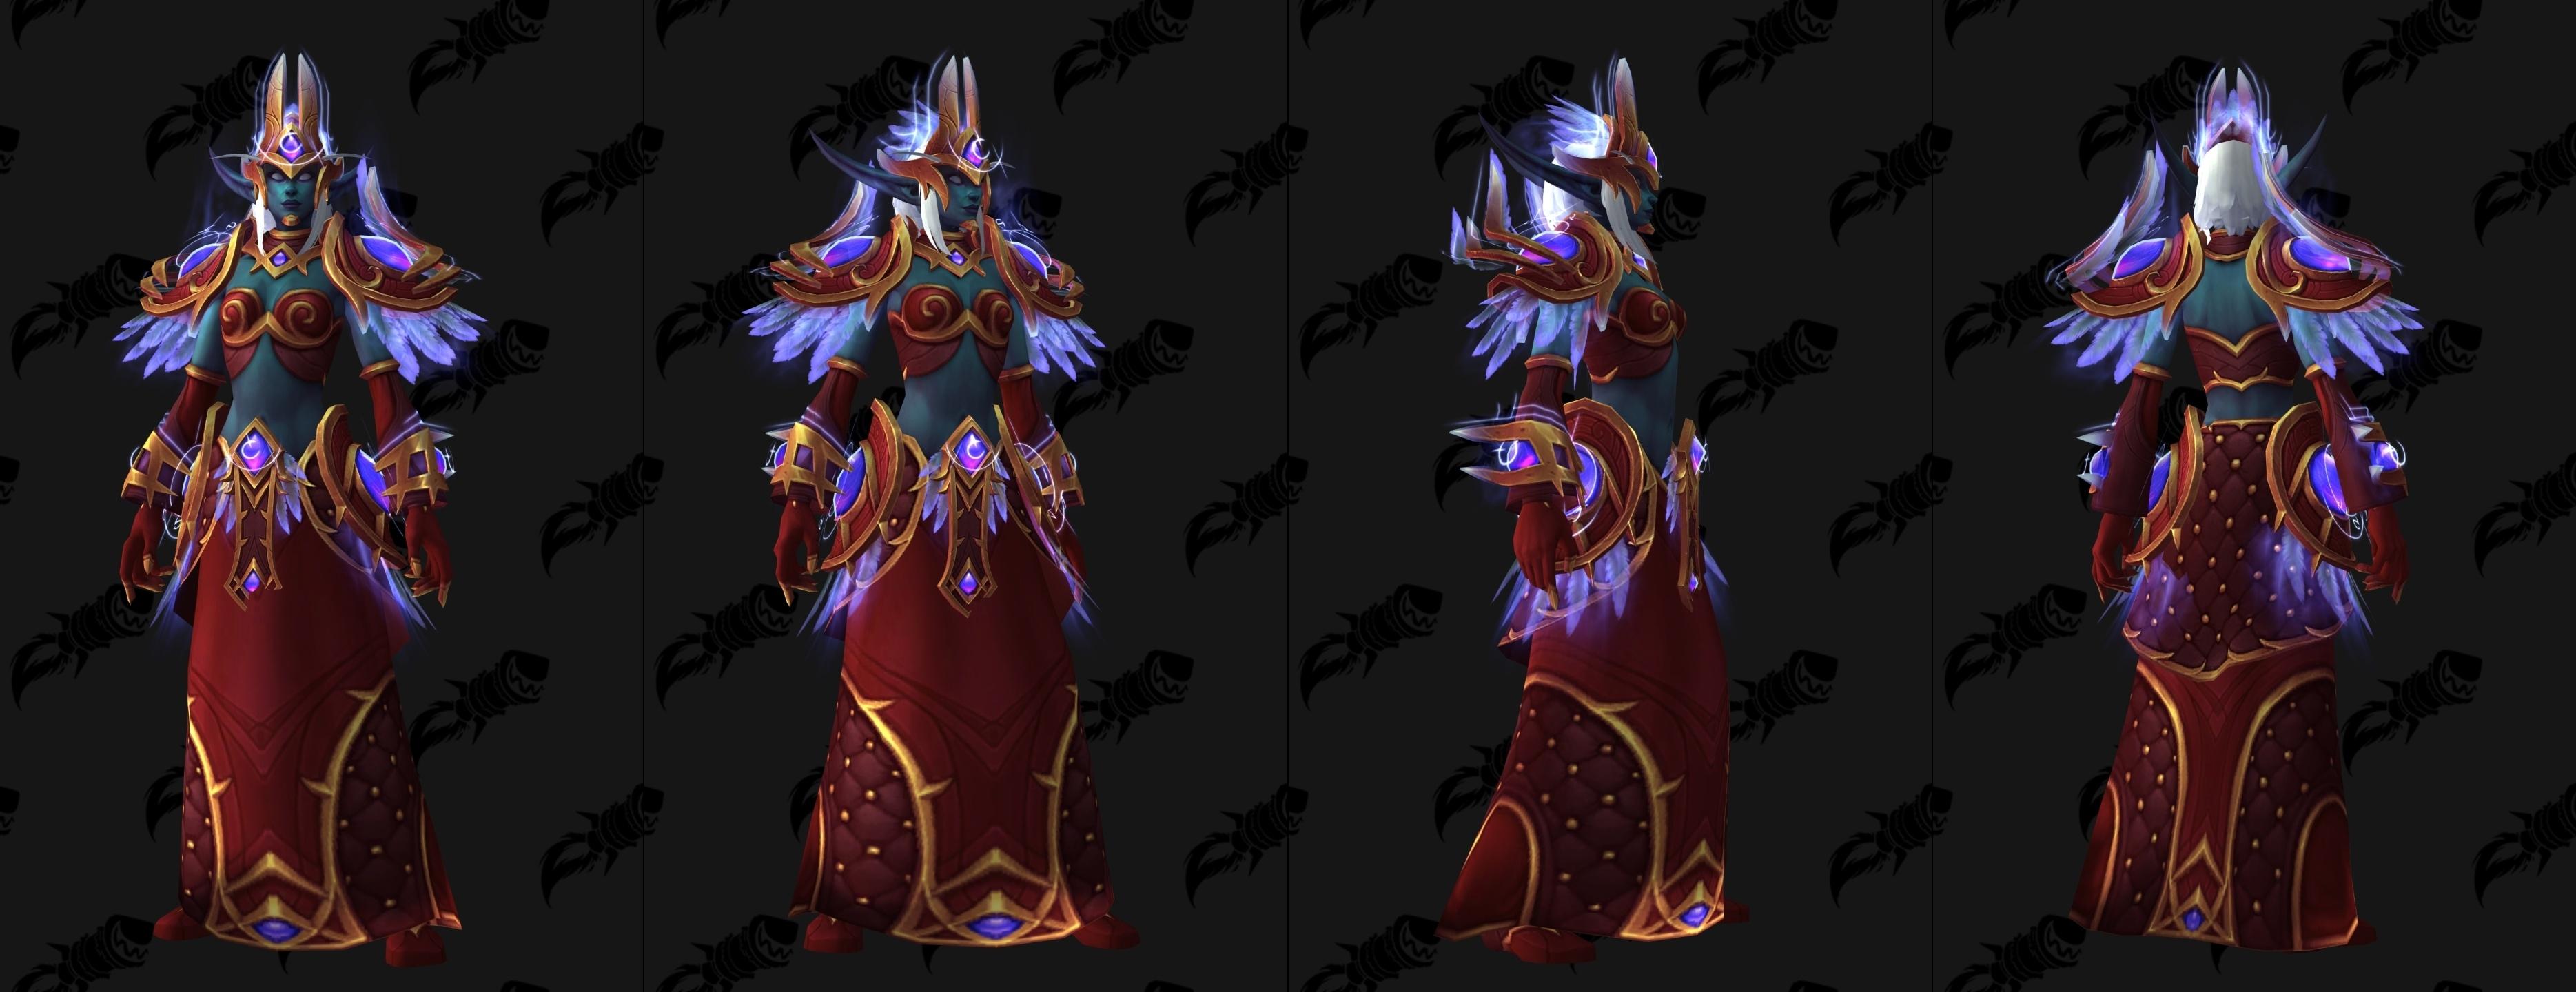 battle for azeroth - heritage armor